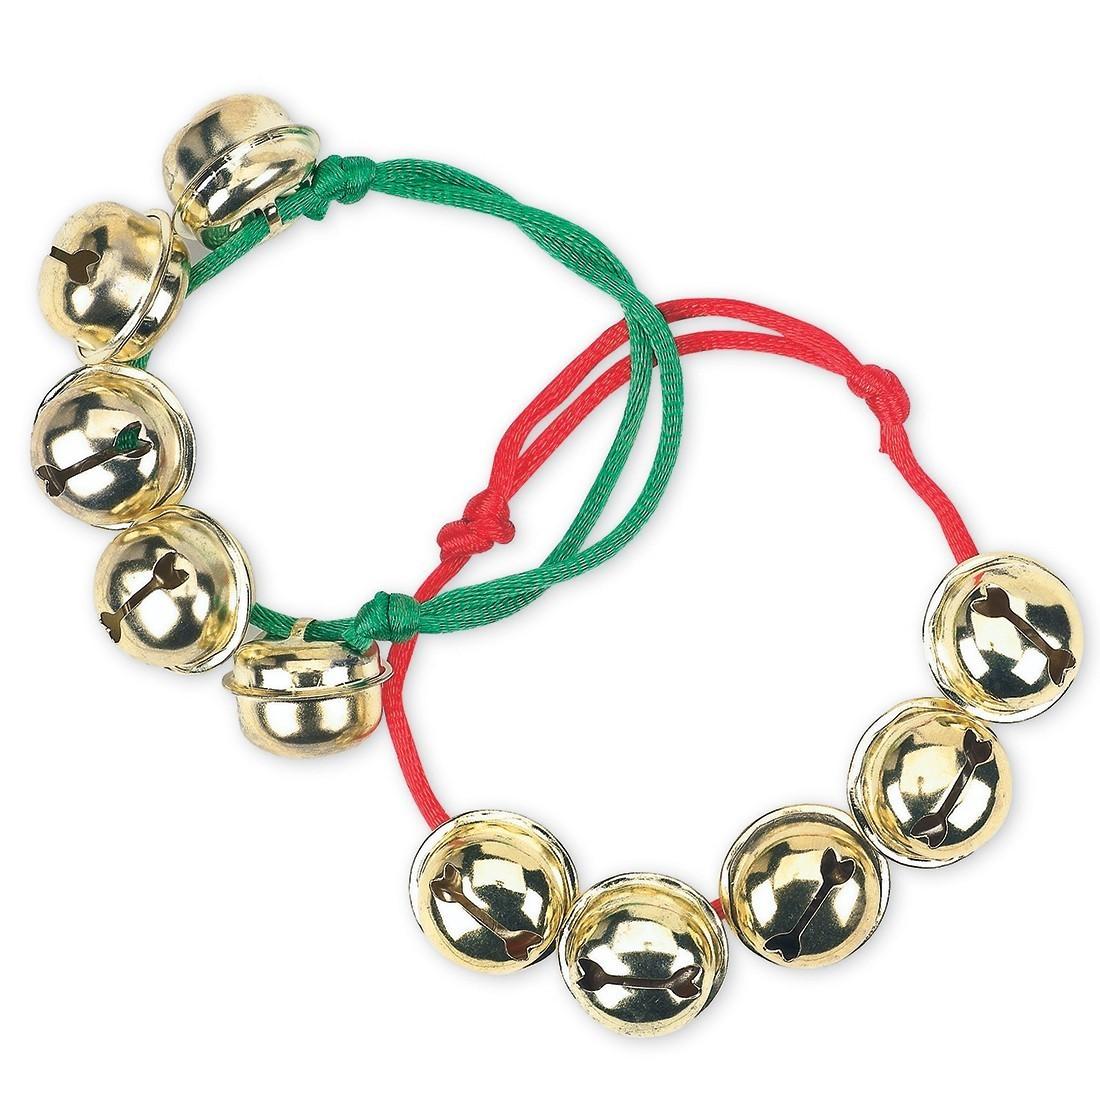 Jingle Bell Bracelets [image]